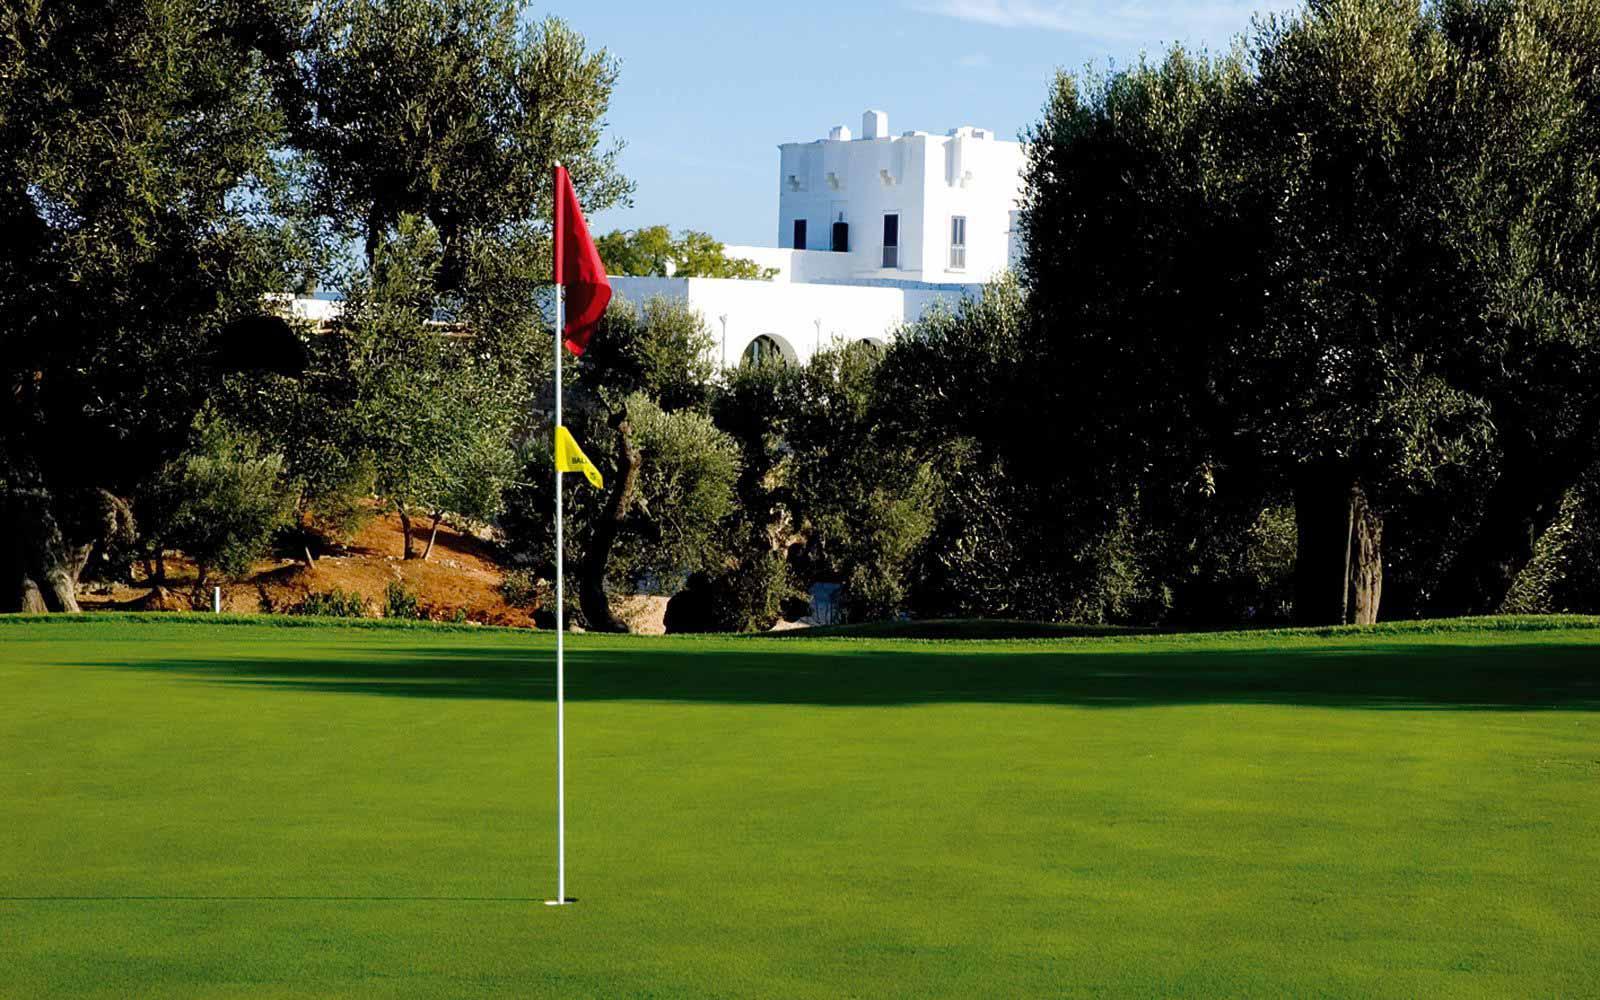 Golf course at Masseria Torre Maizza